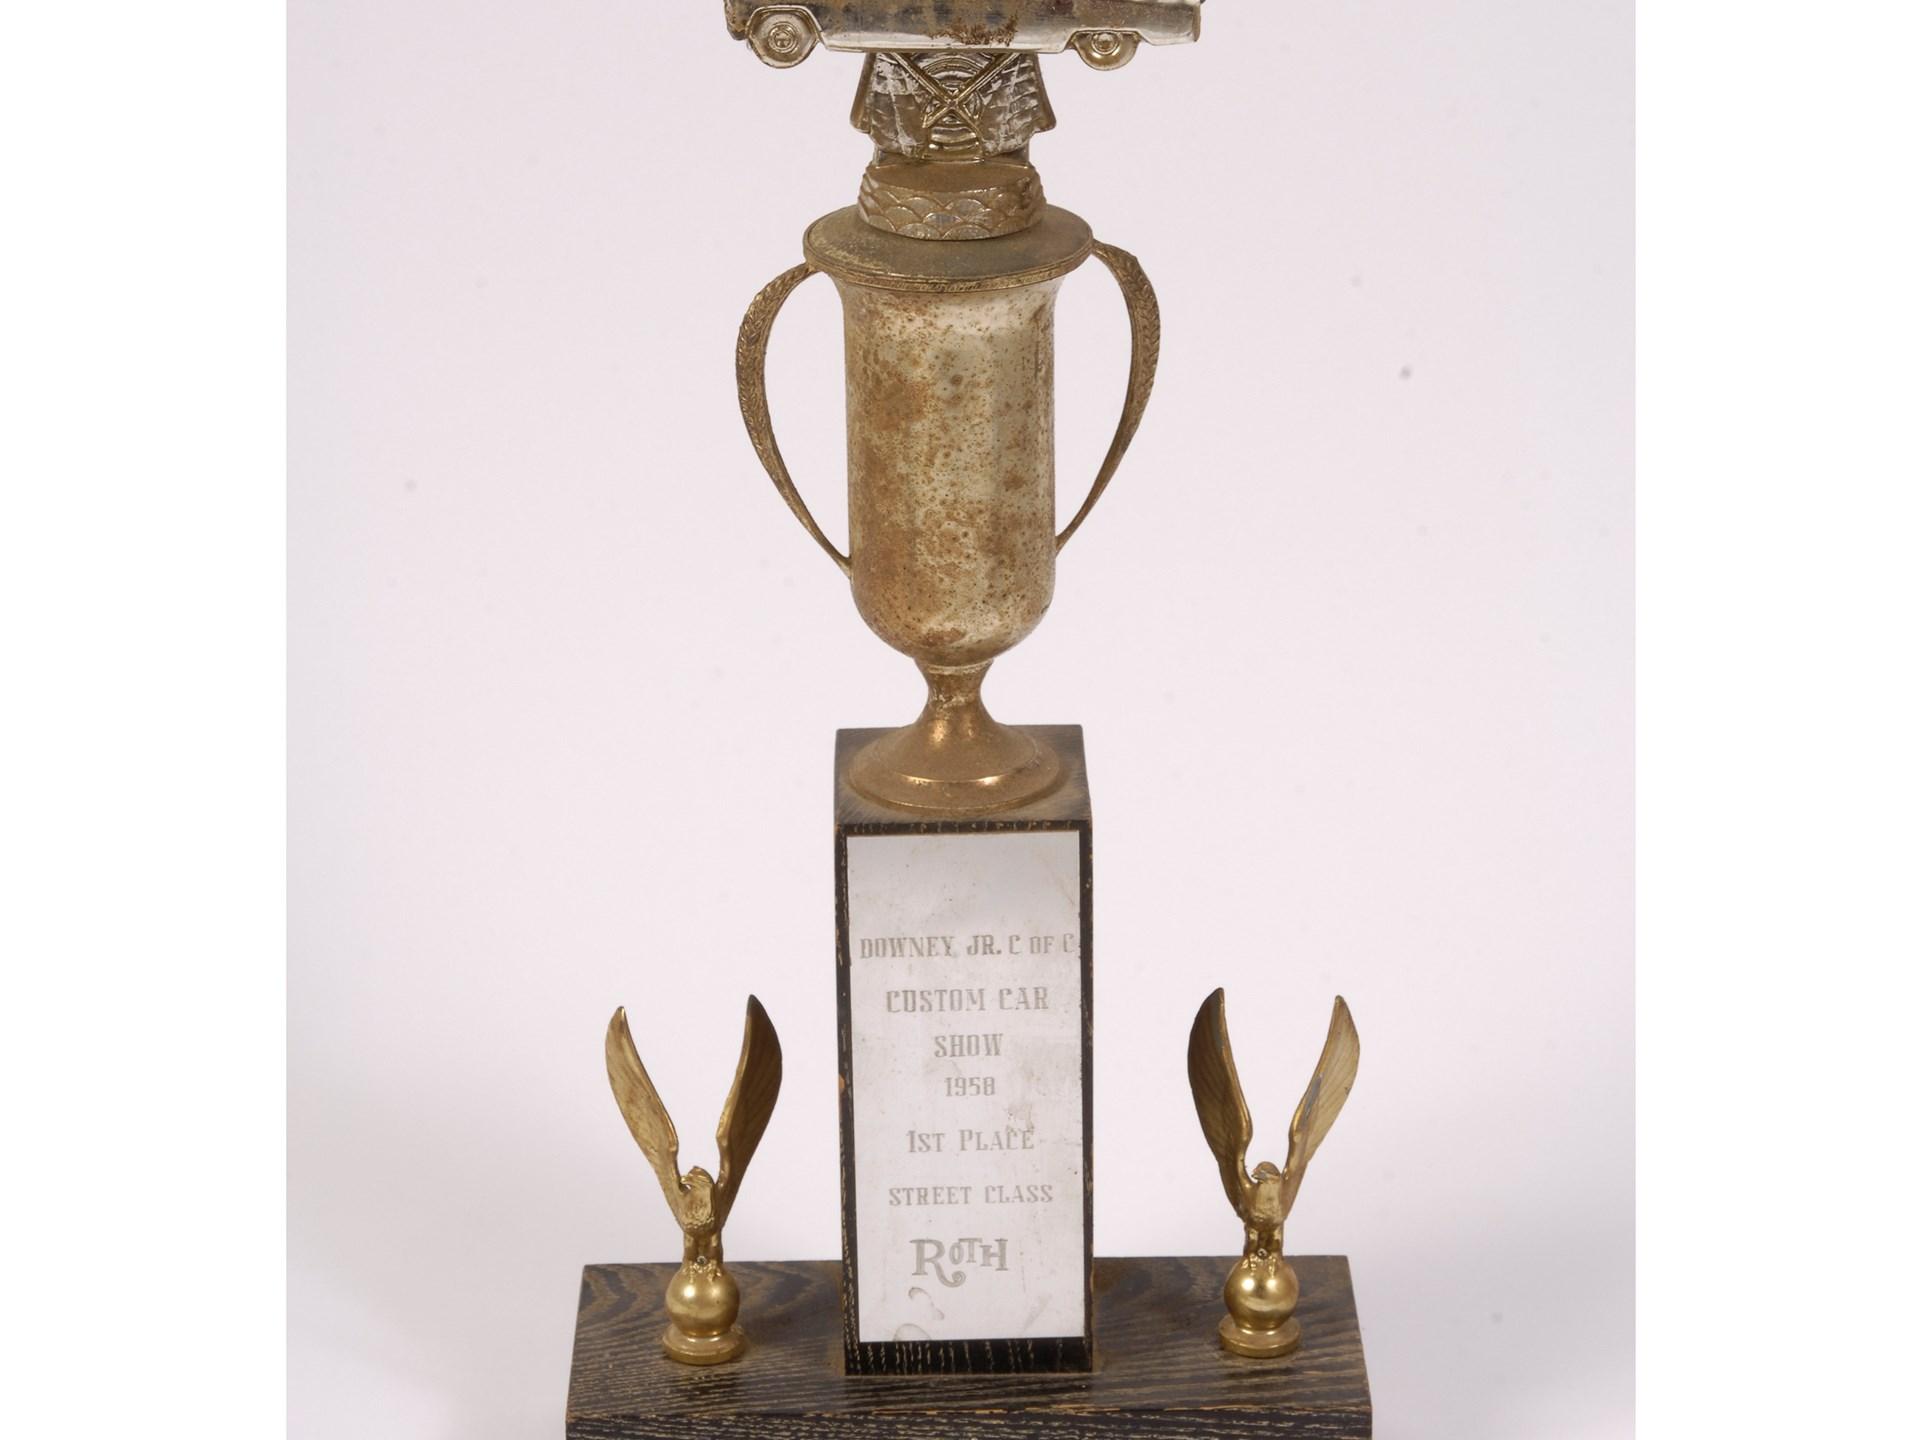 RM Sothebys Ed Big Daddy Roth Custom Car Show Trophy - Car show trophy packages